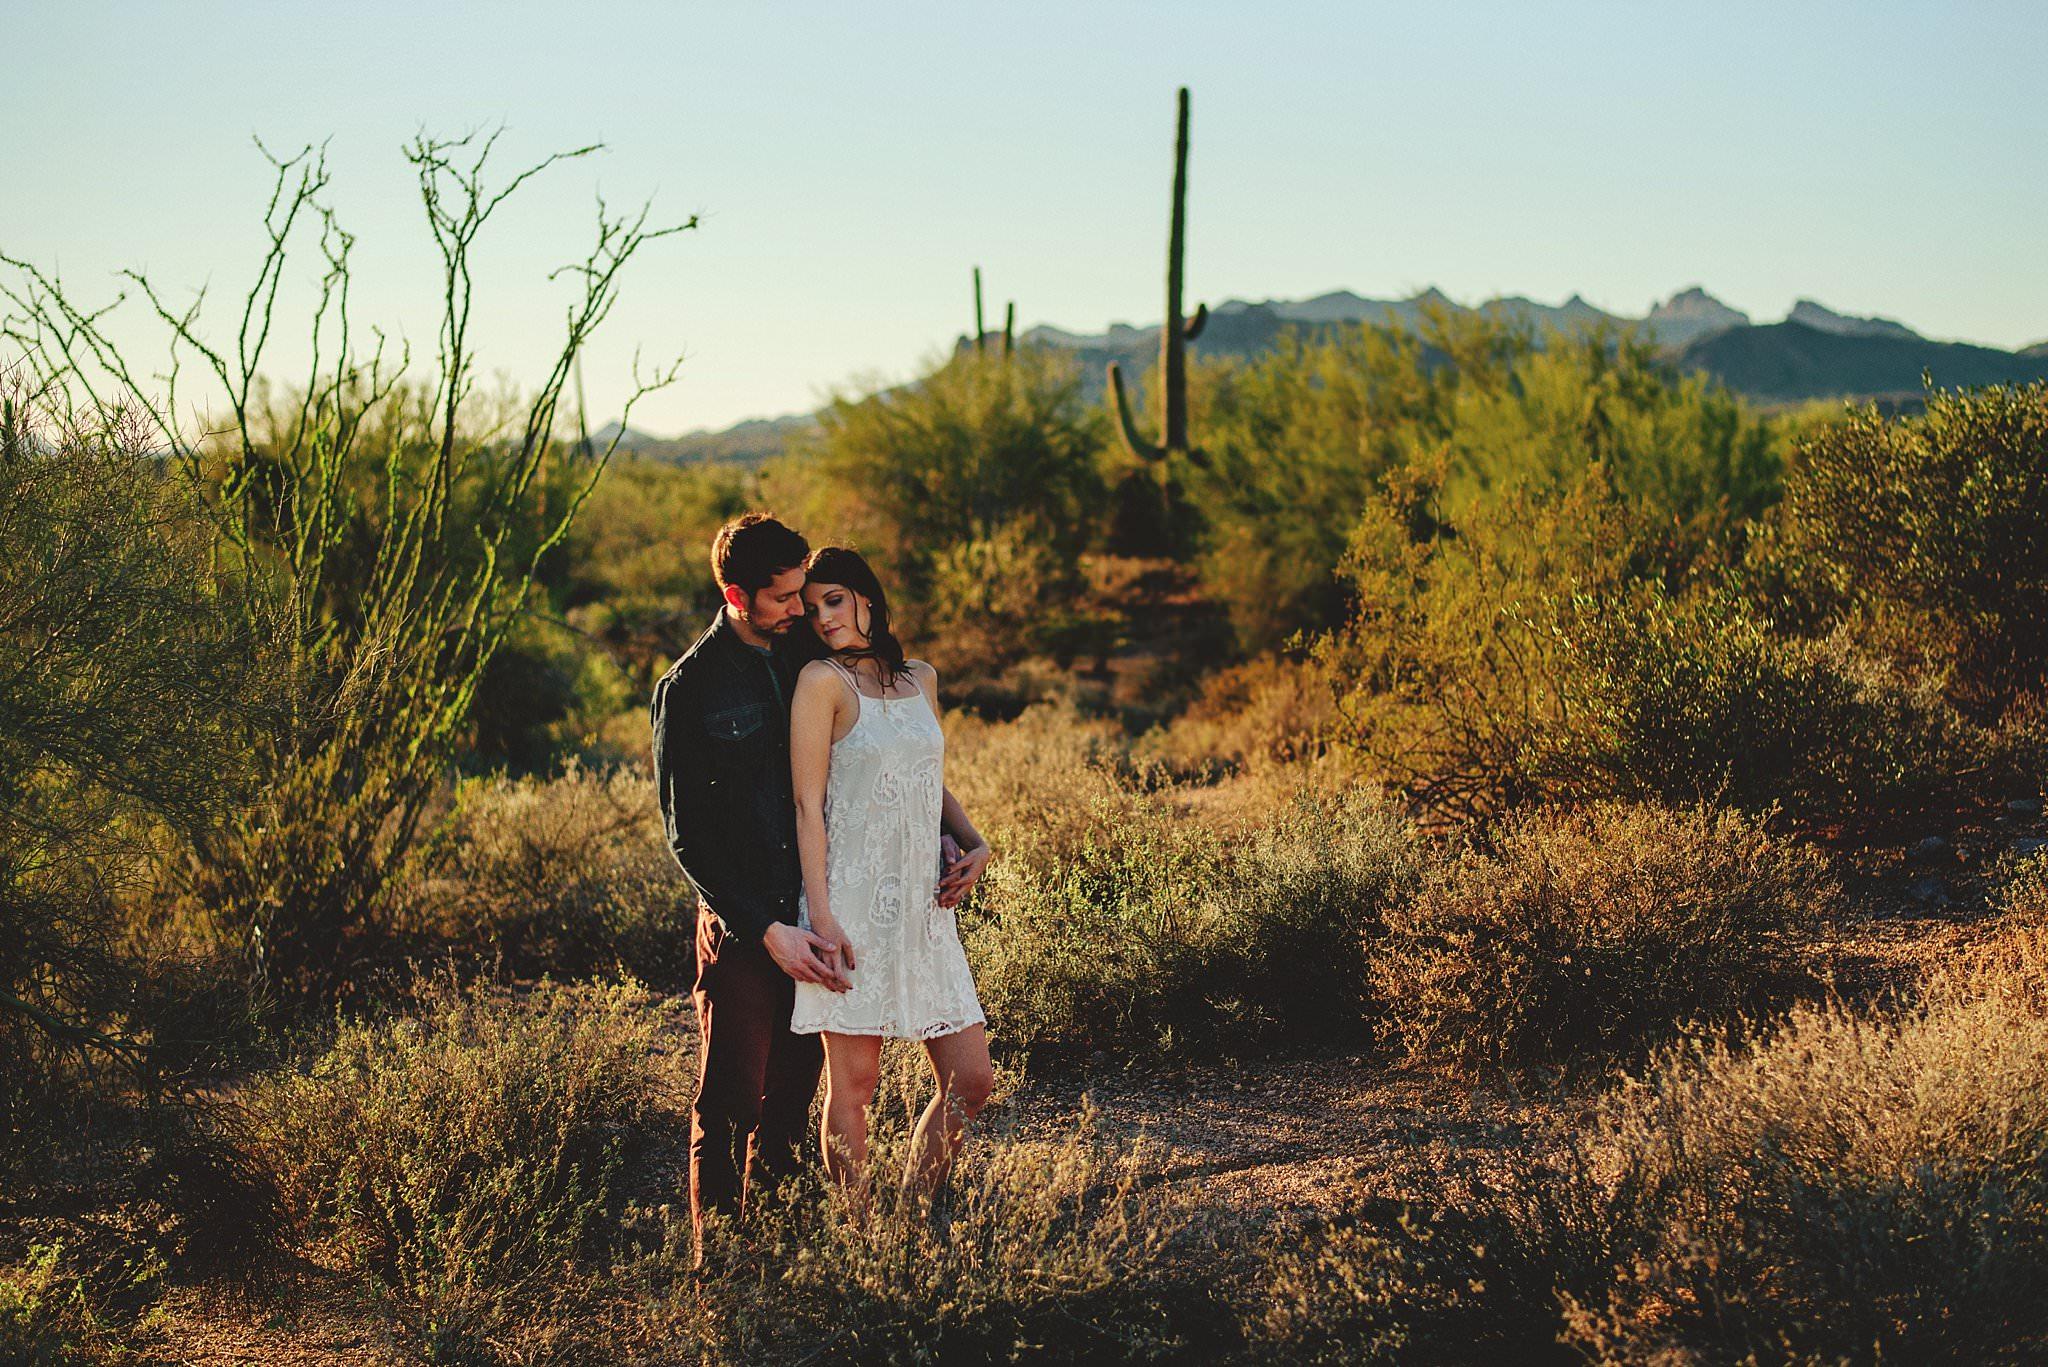 superstition-mountains-desert-engagement-photos-0015.jpg